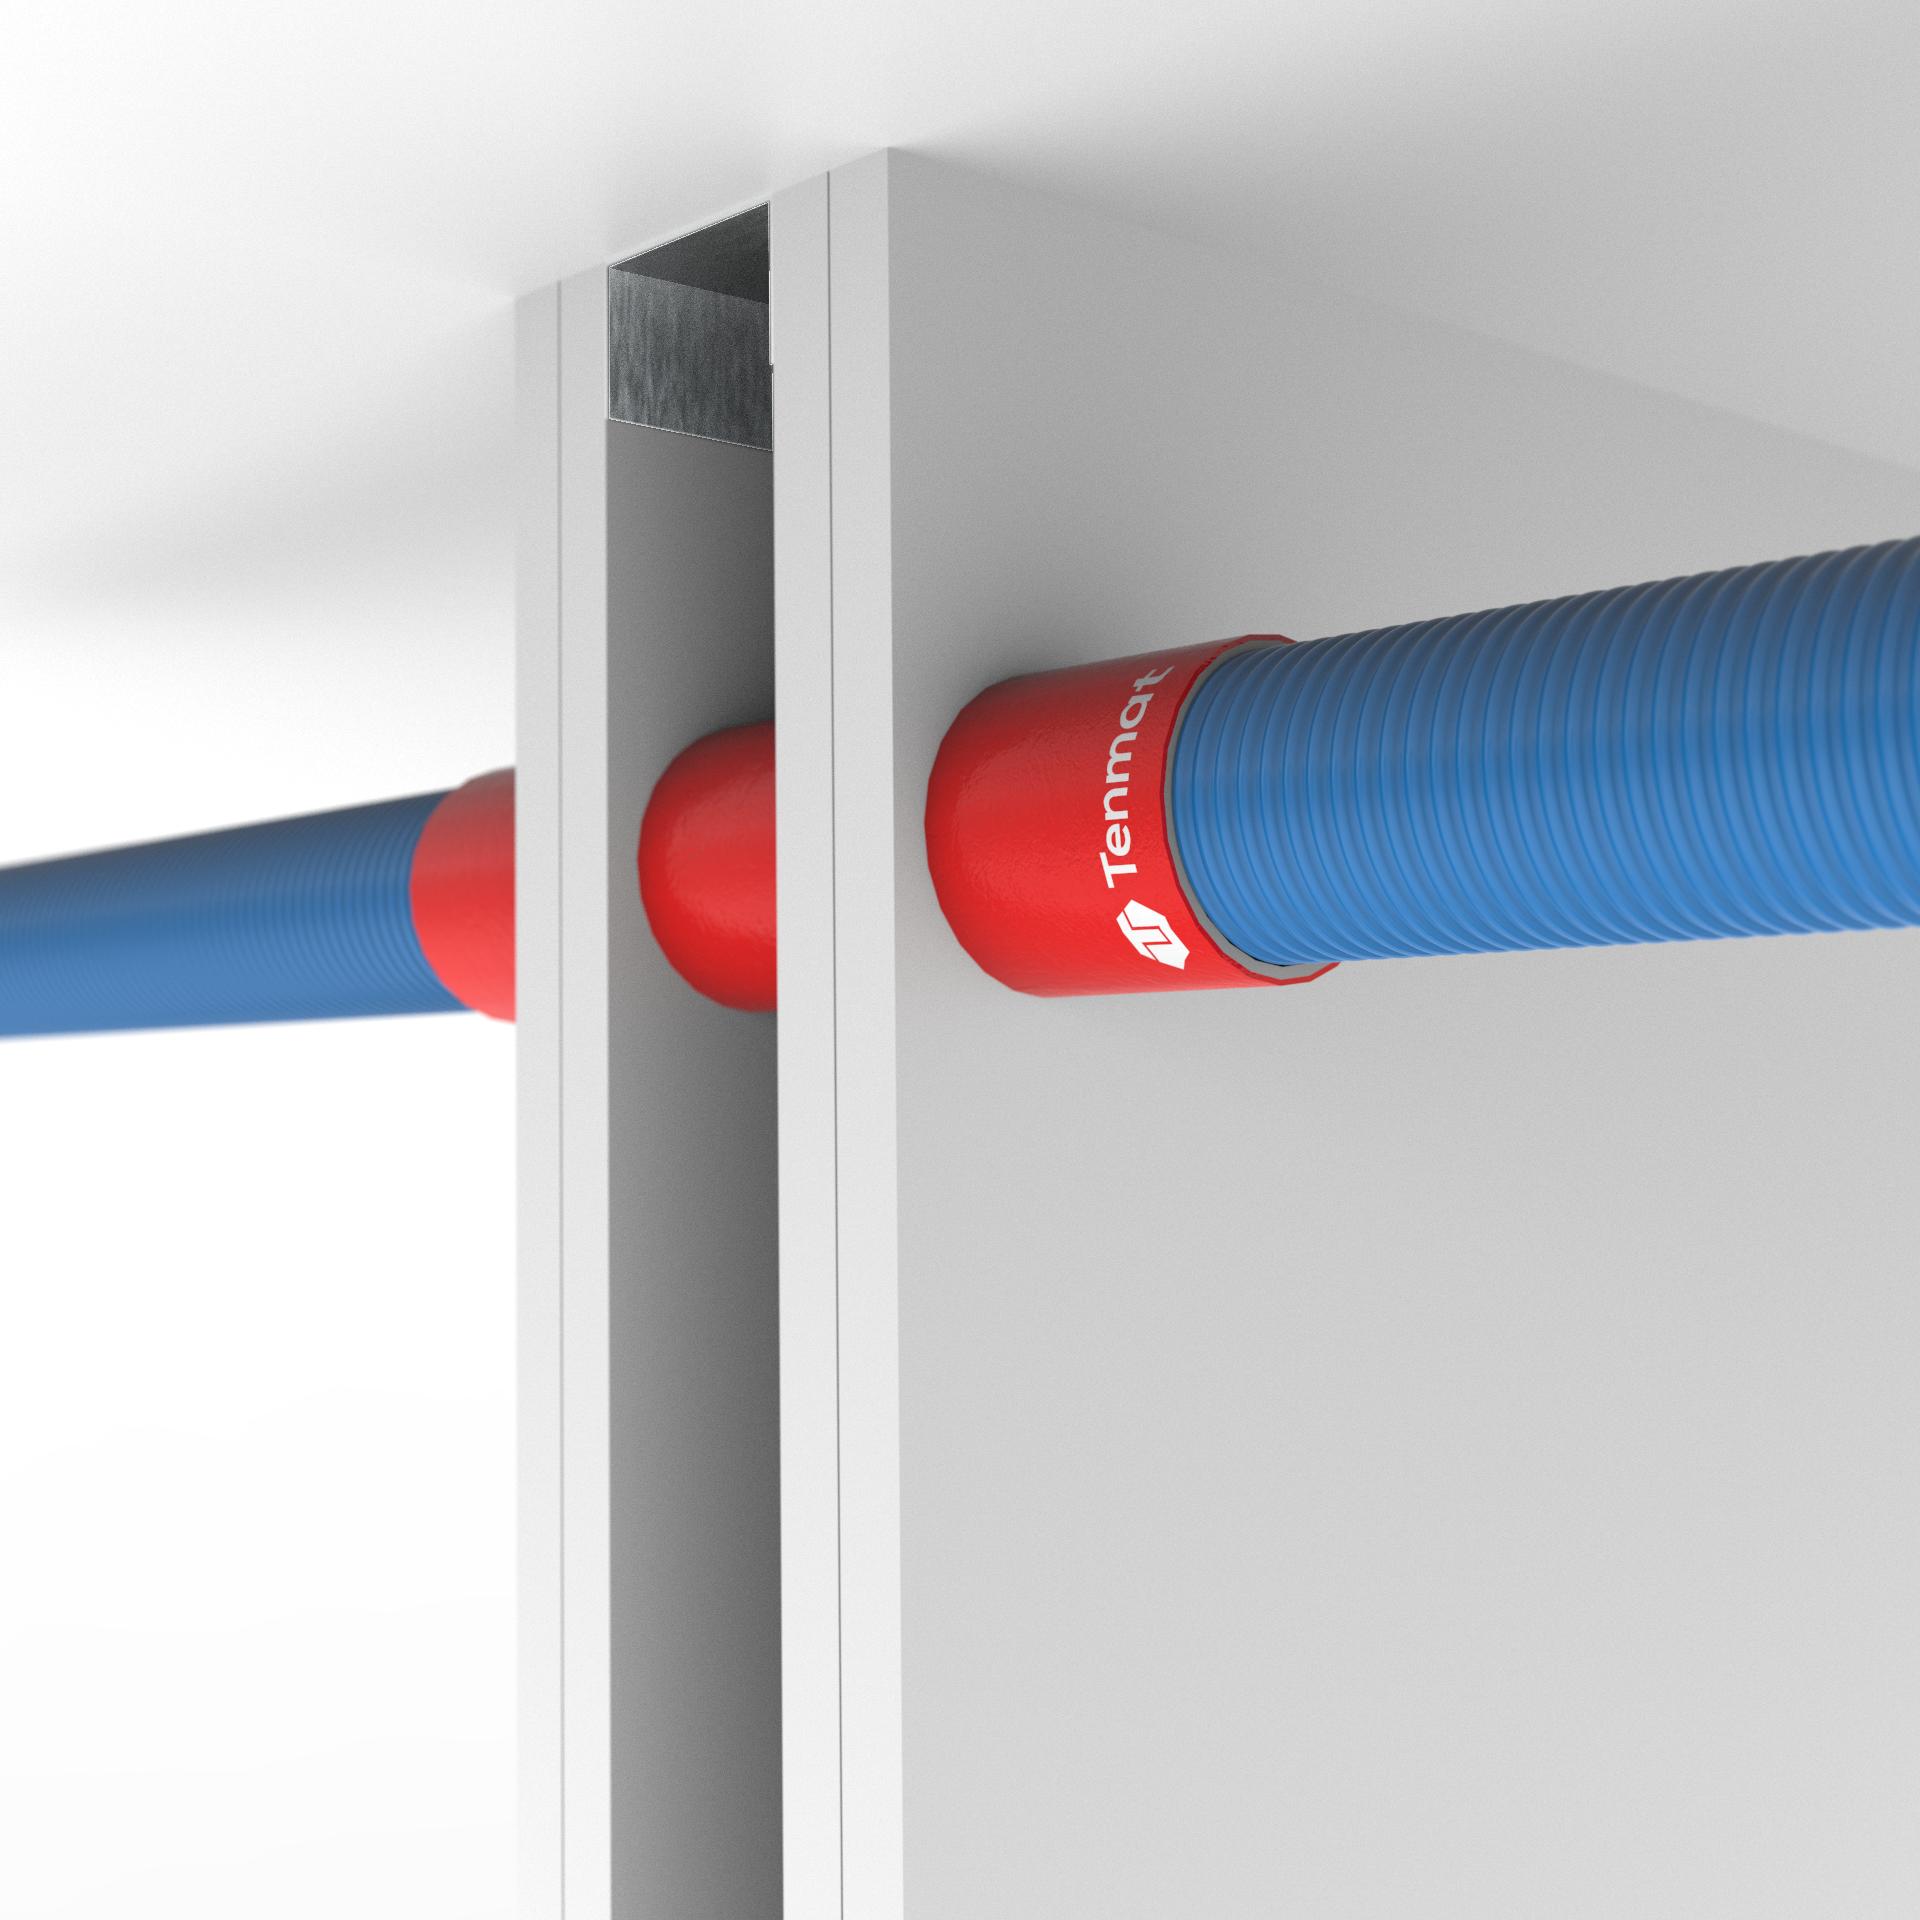 fp-vent-duct-oversleeve-in-situ-2021.314